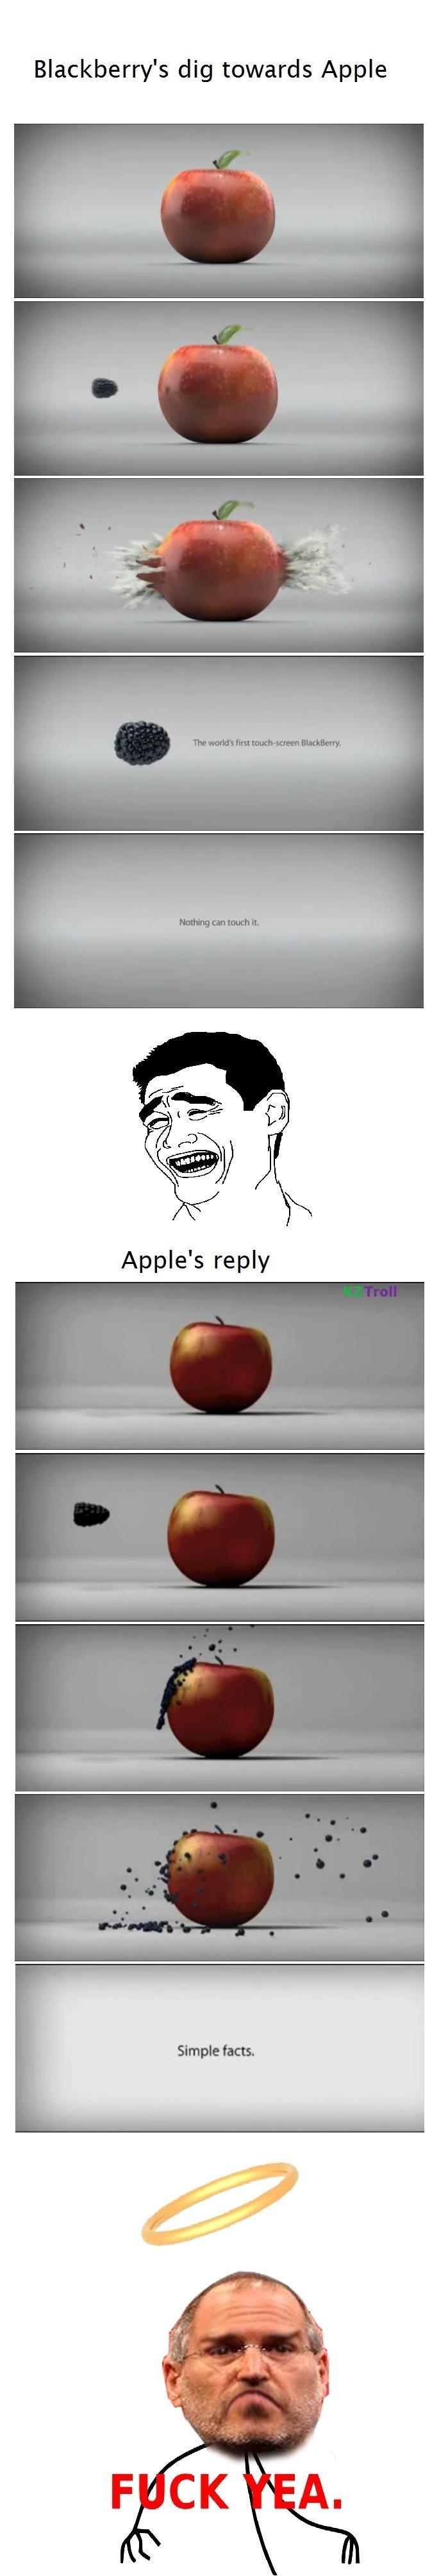 Apple vs Blackberry. .. divided in business.....united in pies. Apple blackberry